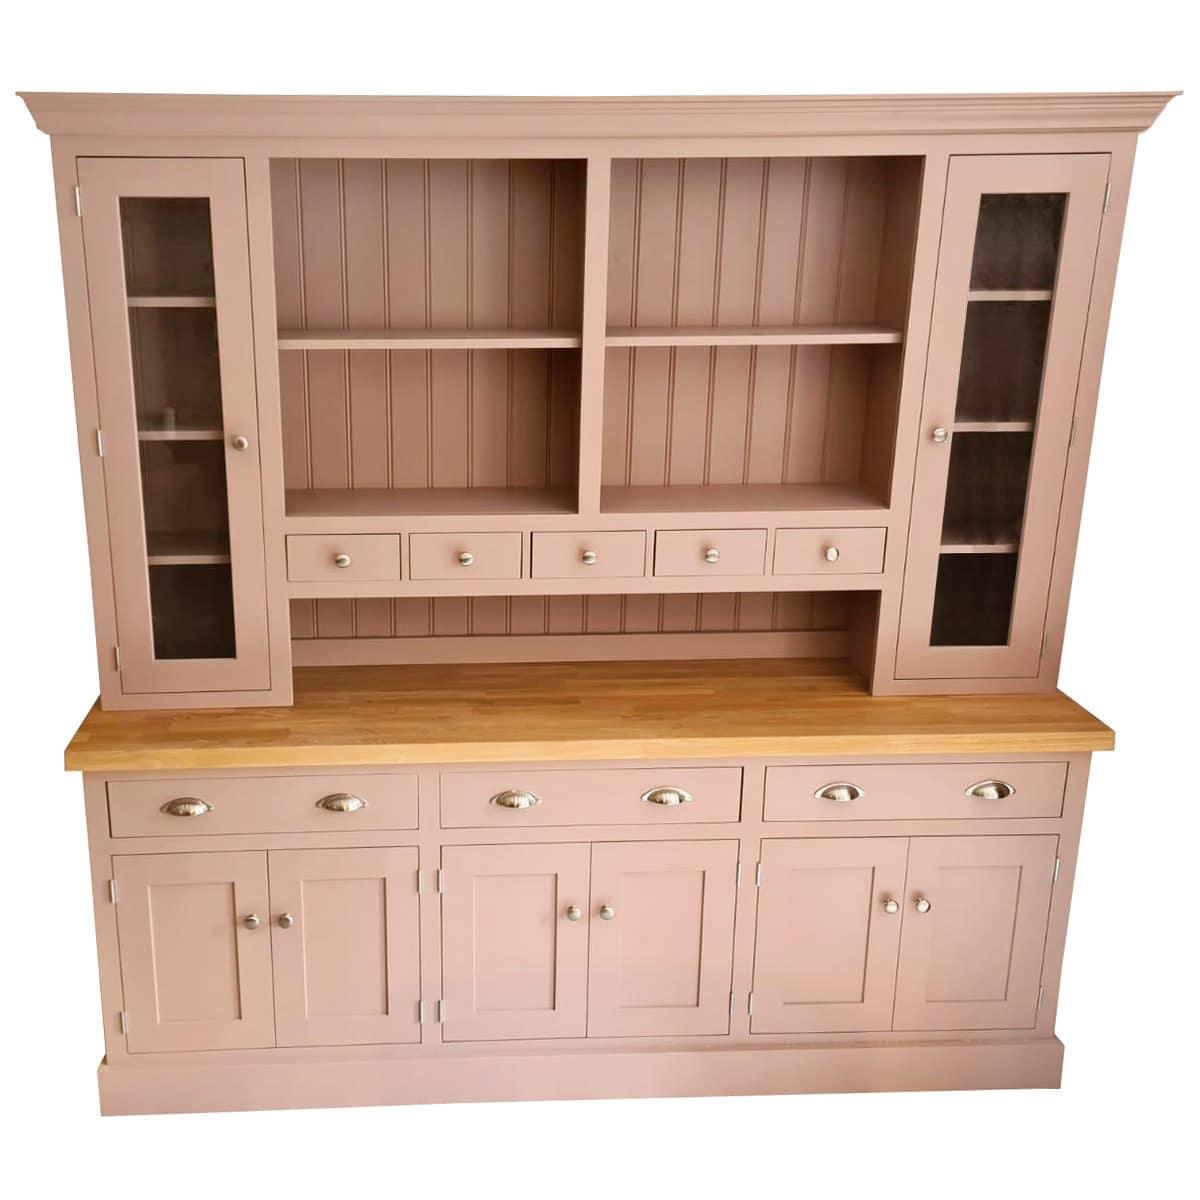 8ft Luke Kitchen Dresser